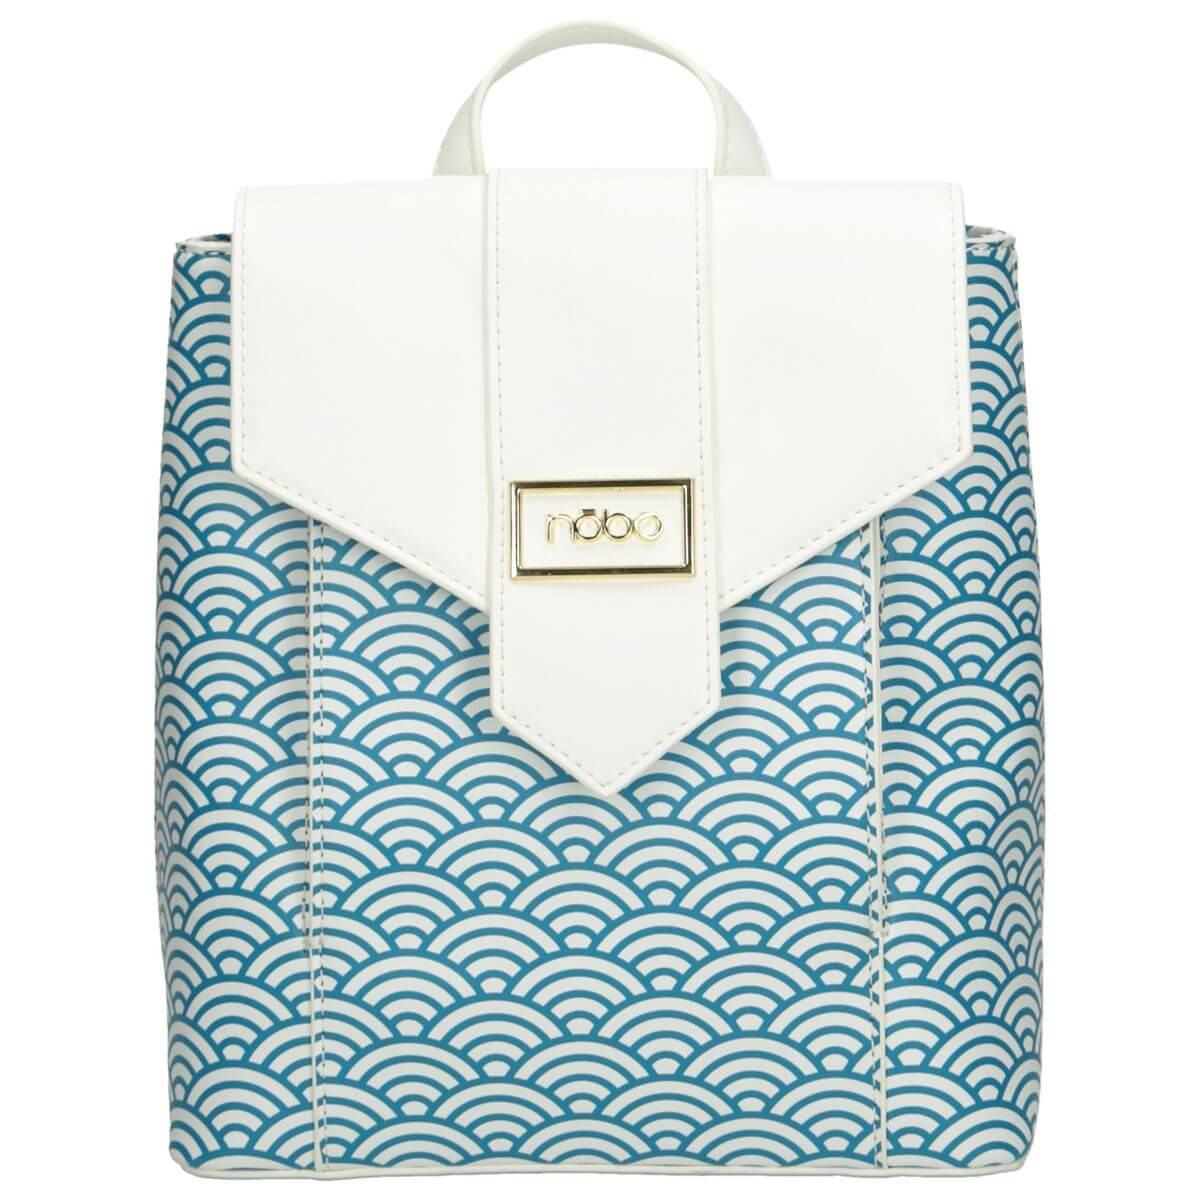 Nobo Woman's Backpack NBAG-I3280-CM00